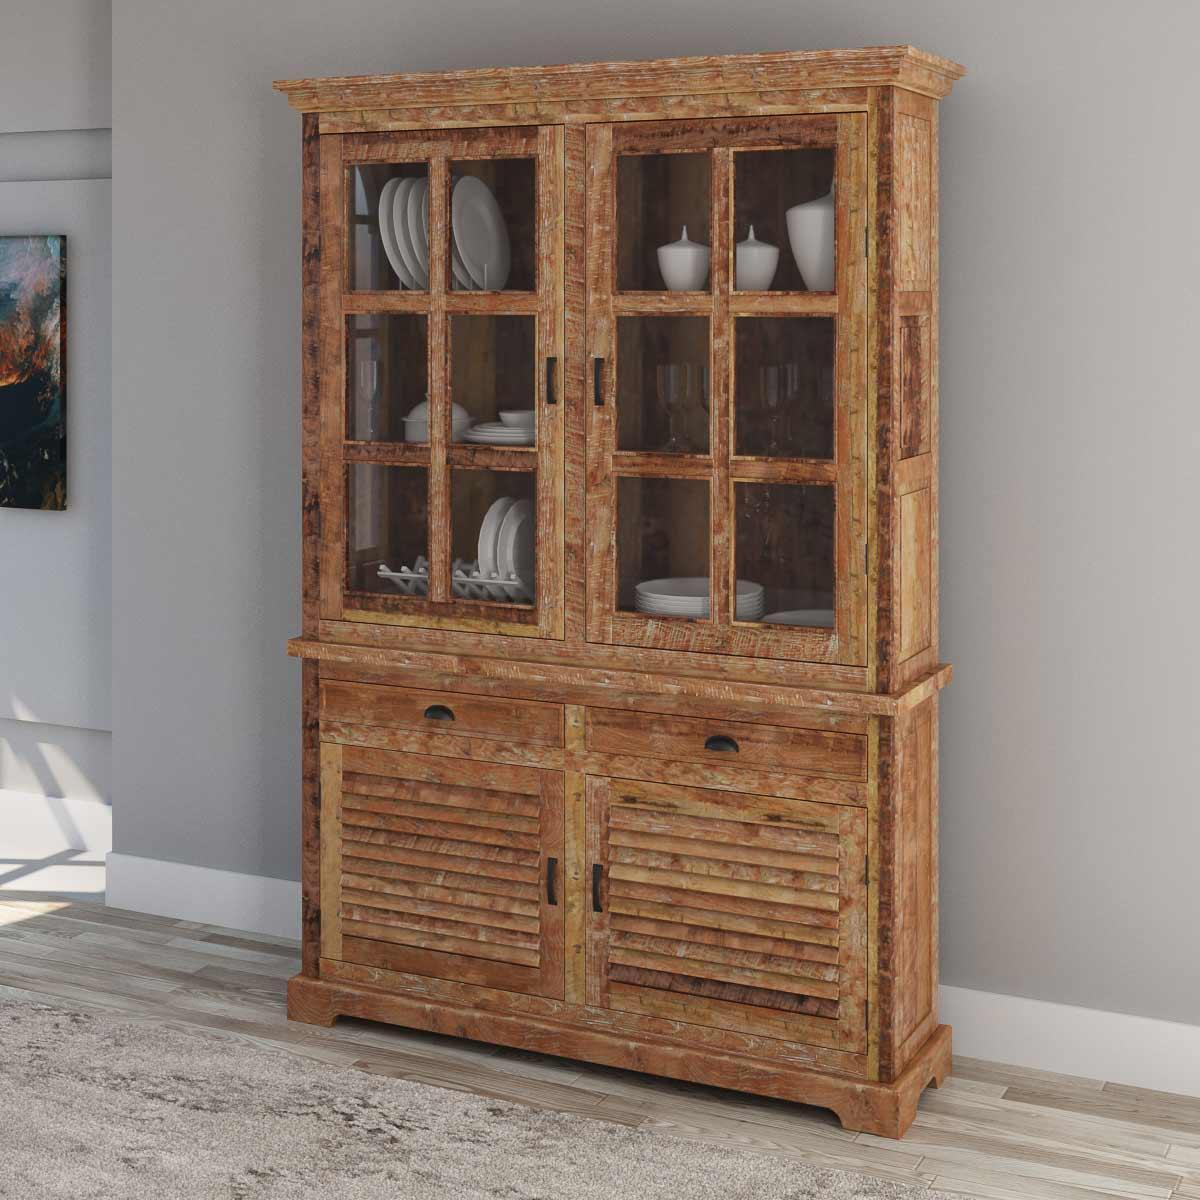 Britain Rustic Teak Wood Tall Handcrafted Hutch